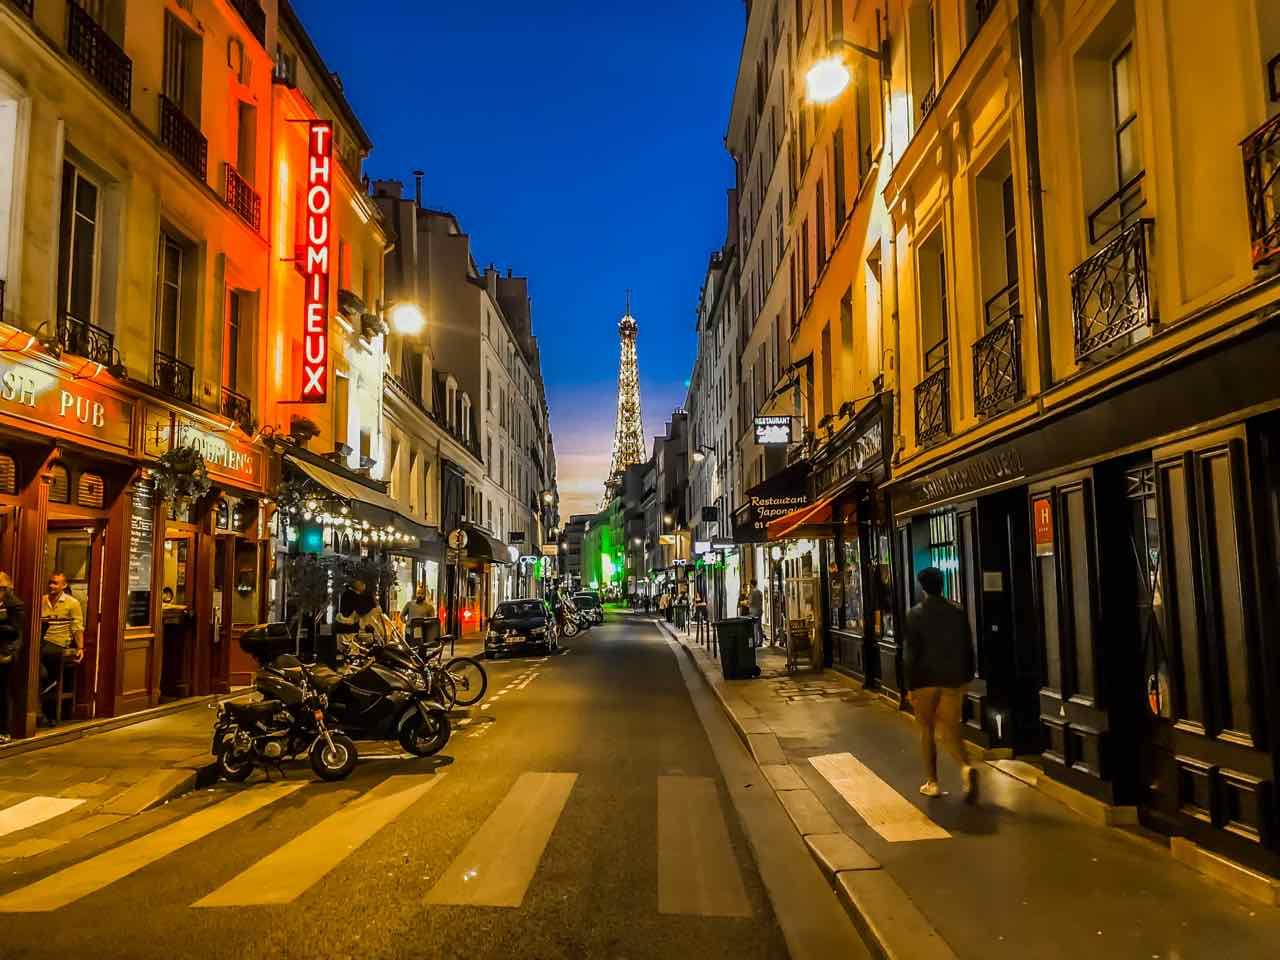 Eiffel Tower on Rue Saint-Dominique